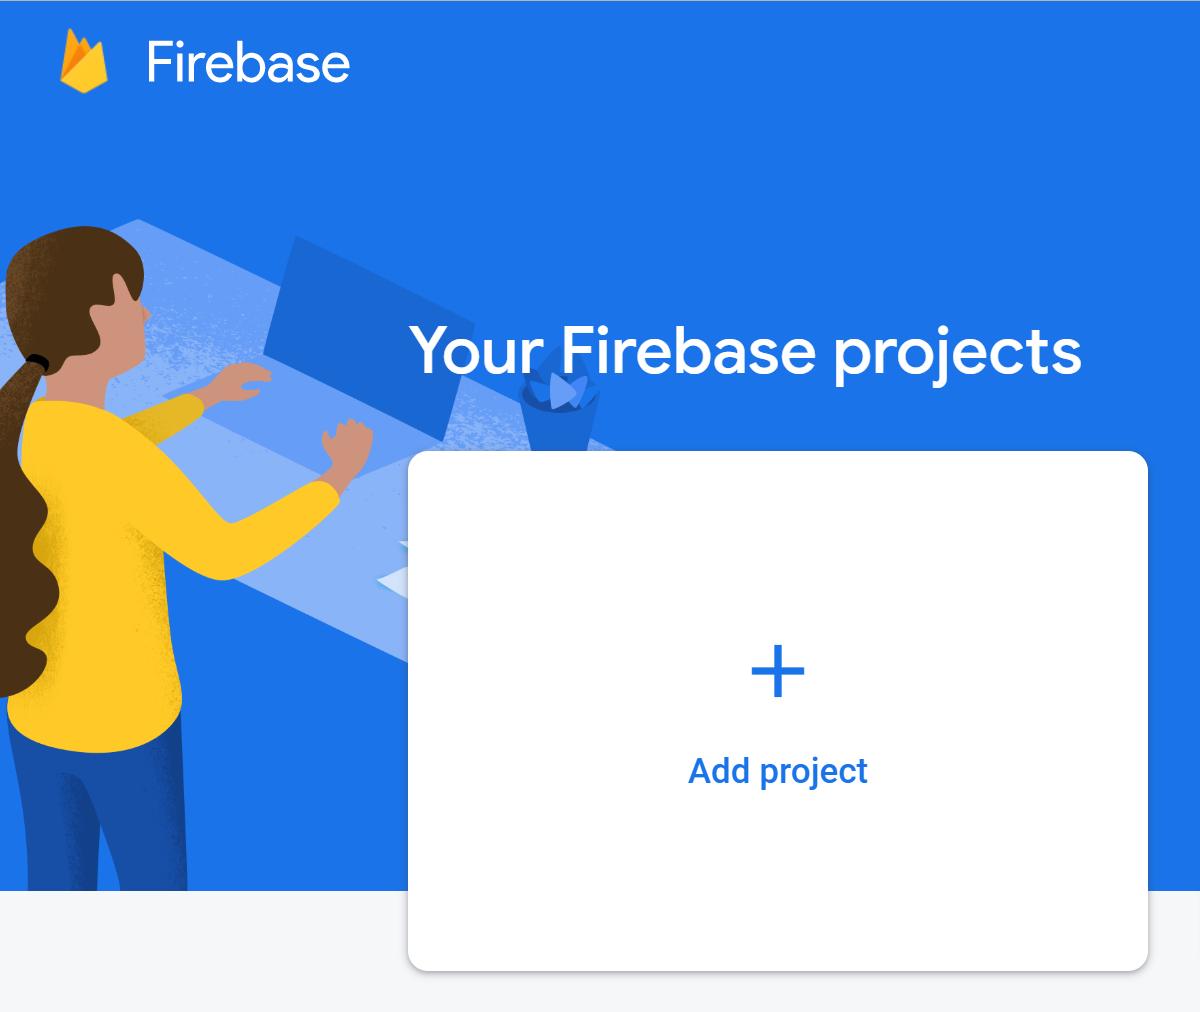 FirebaseProjects